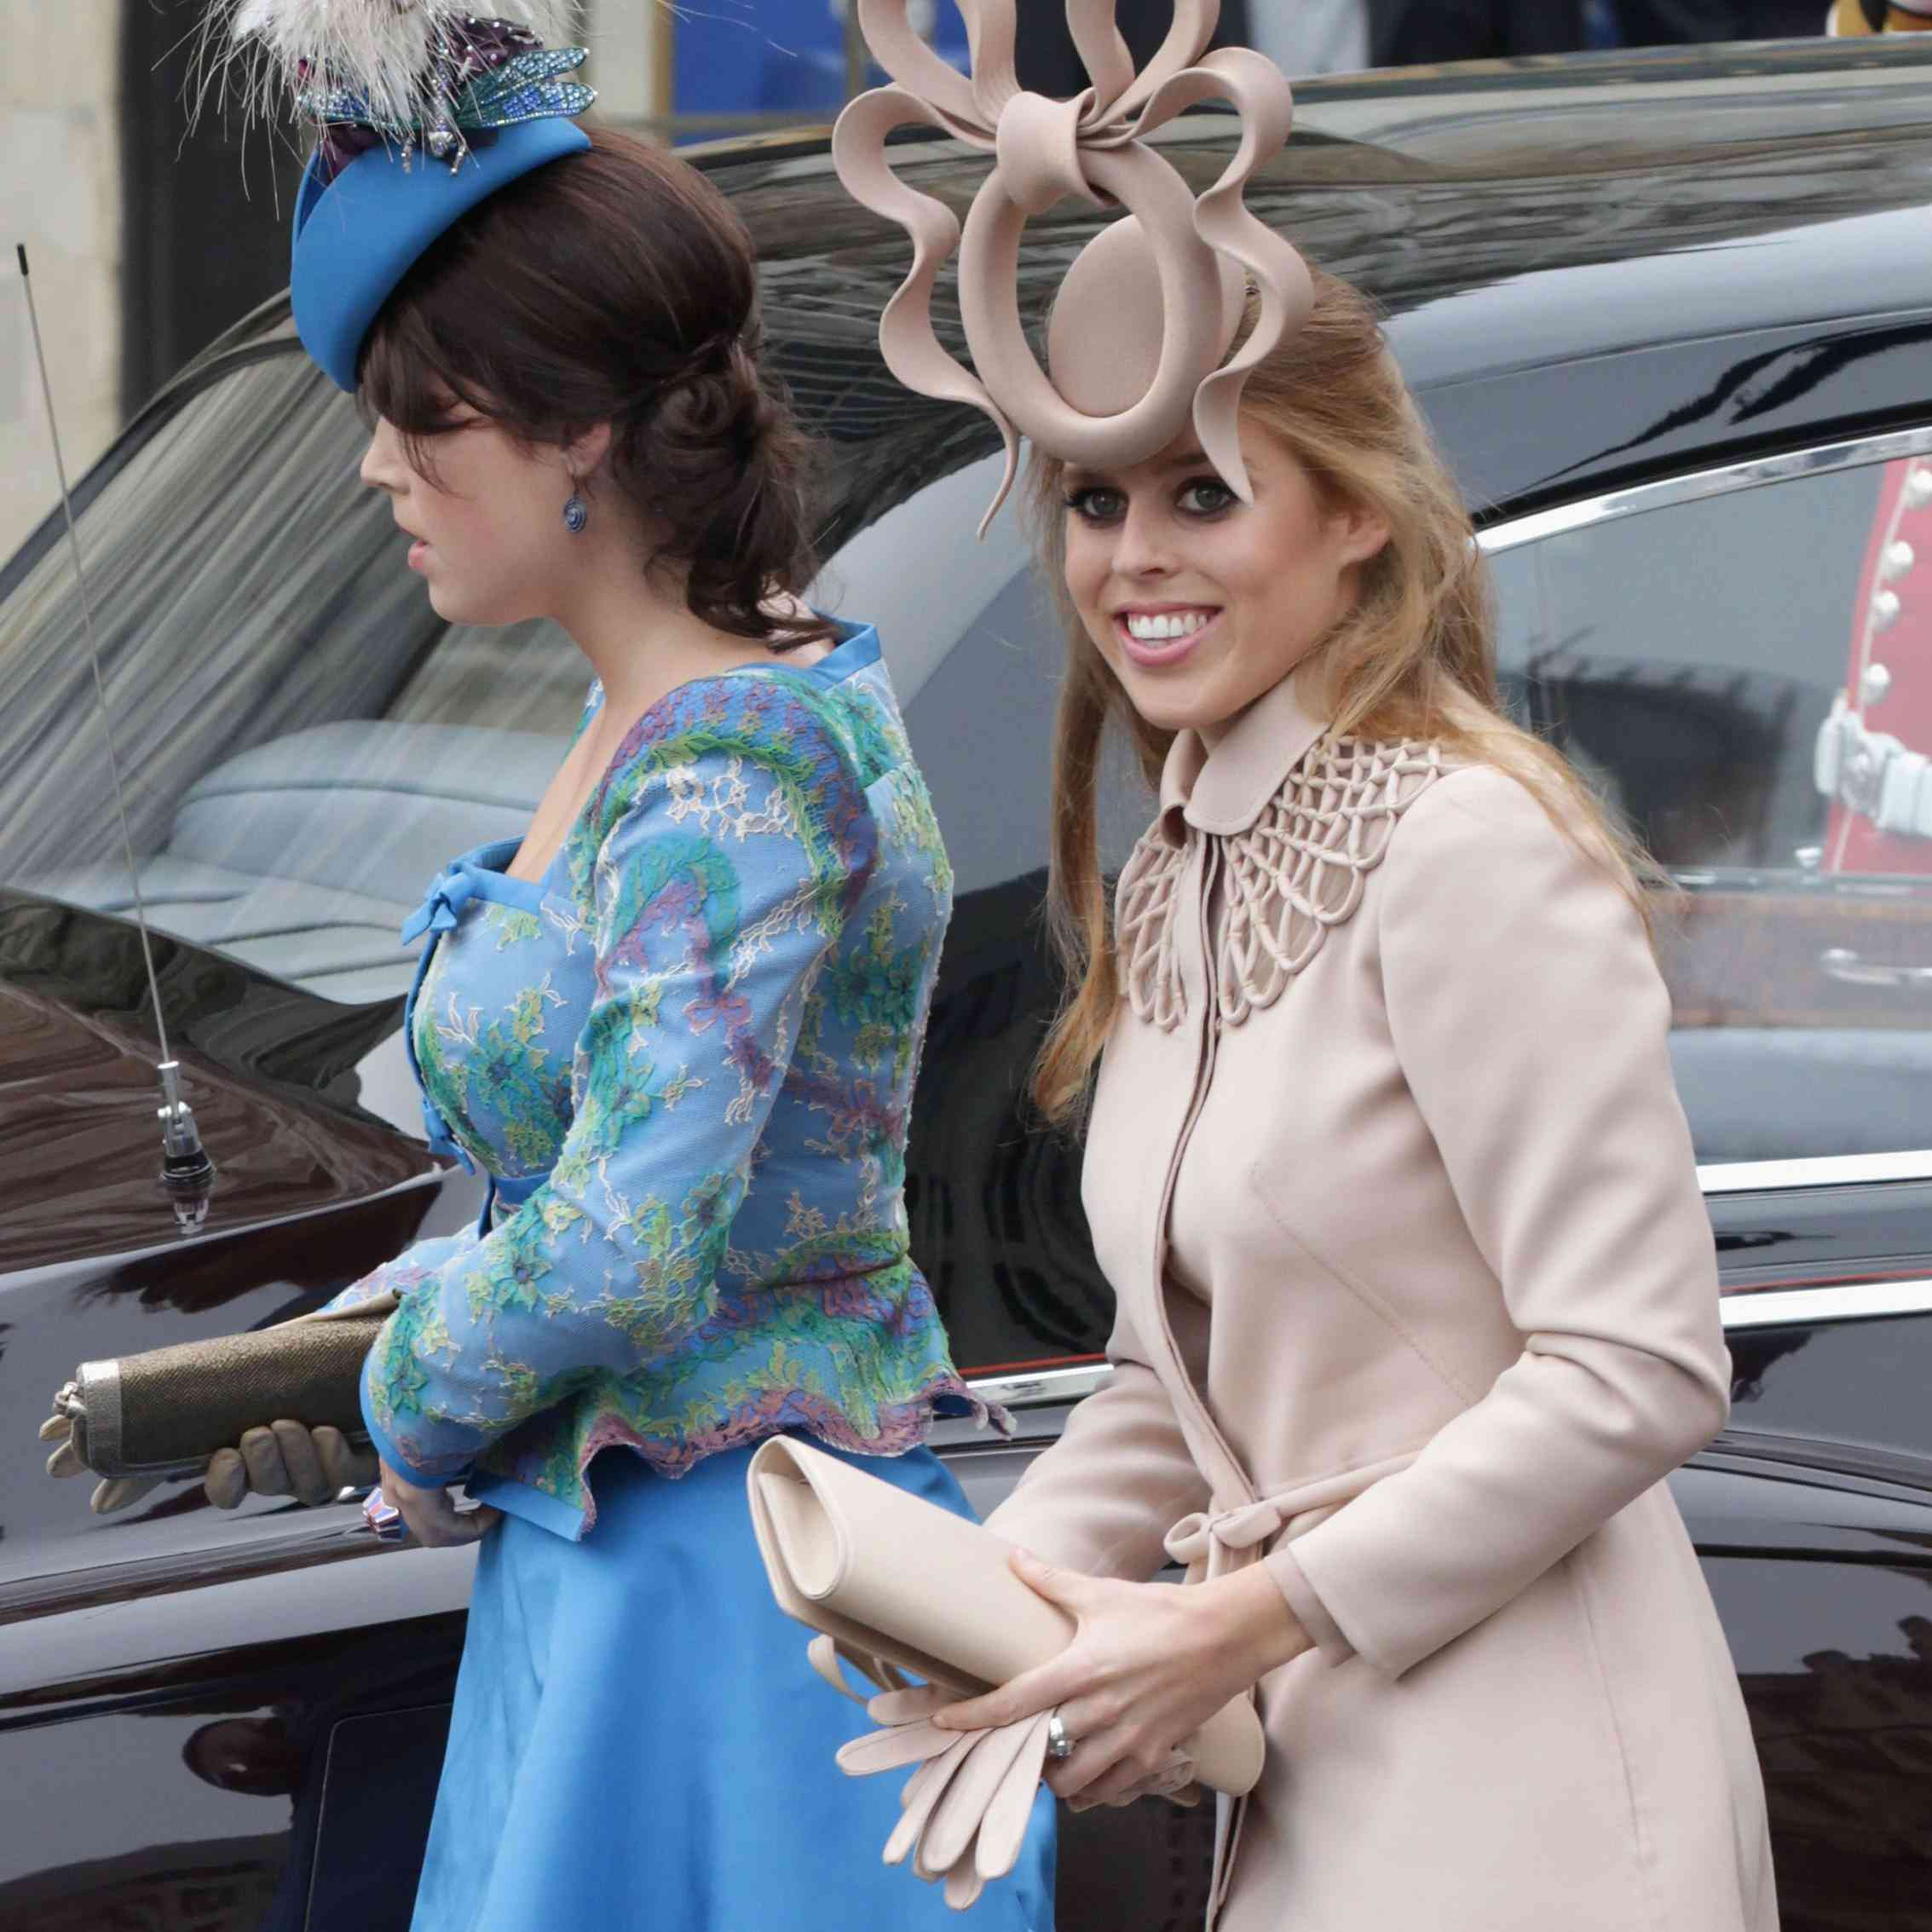 Princess Beatrice of York with her sister Princess Eugenie of York